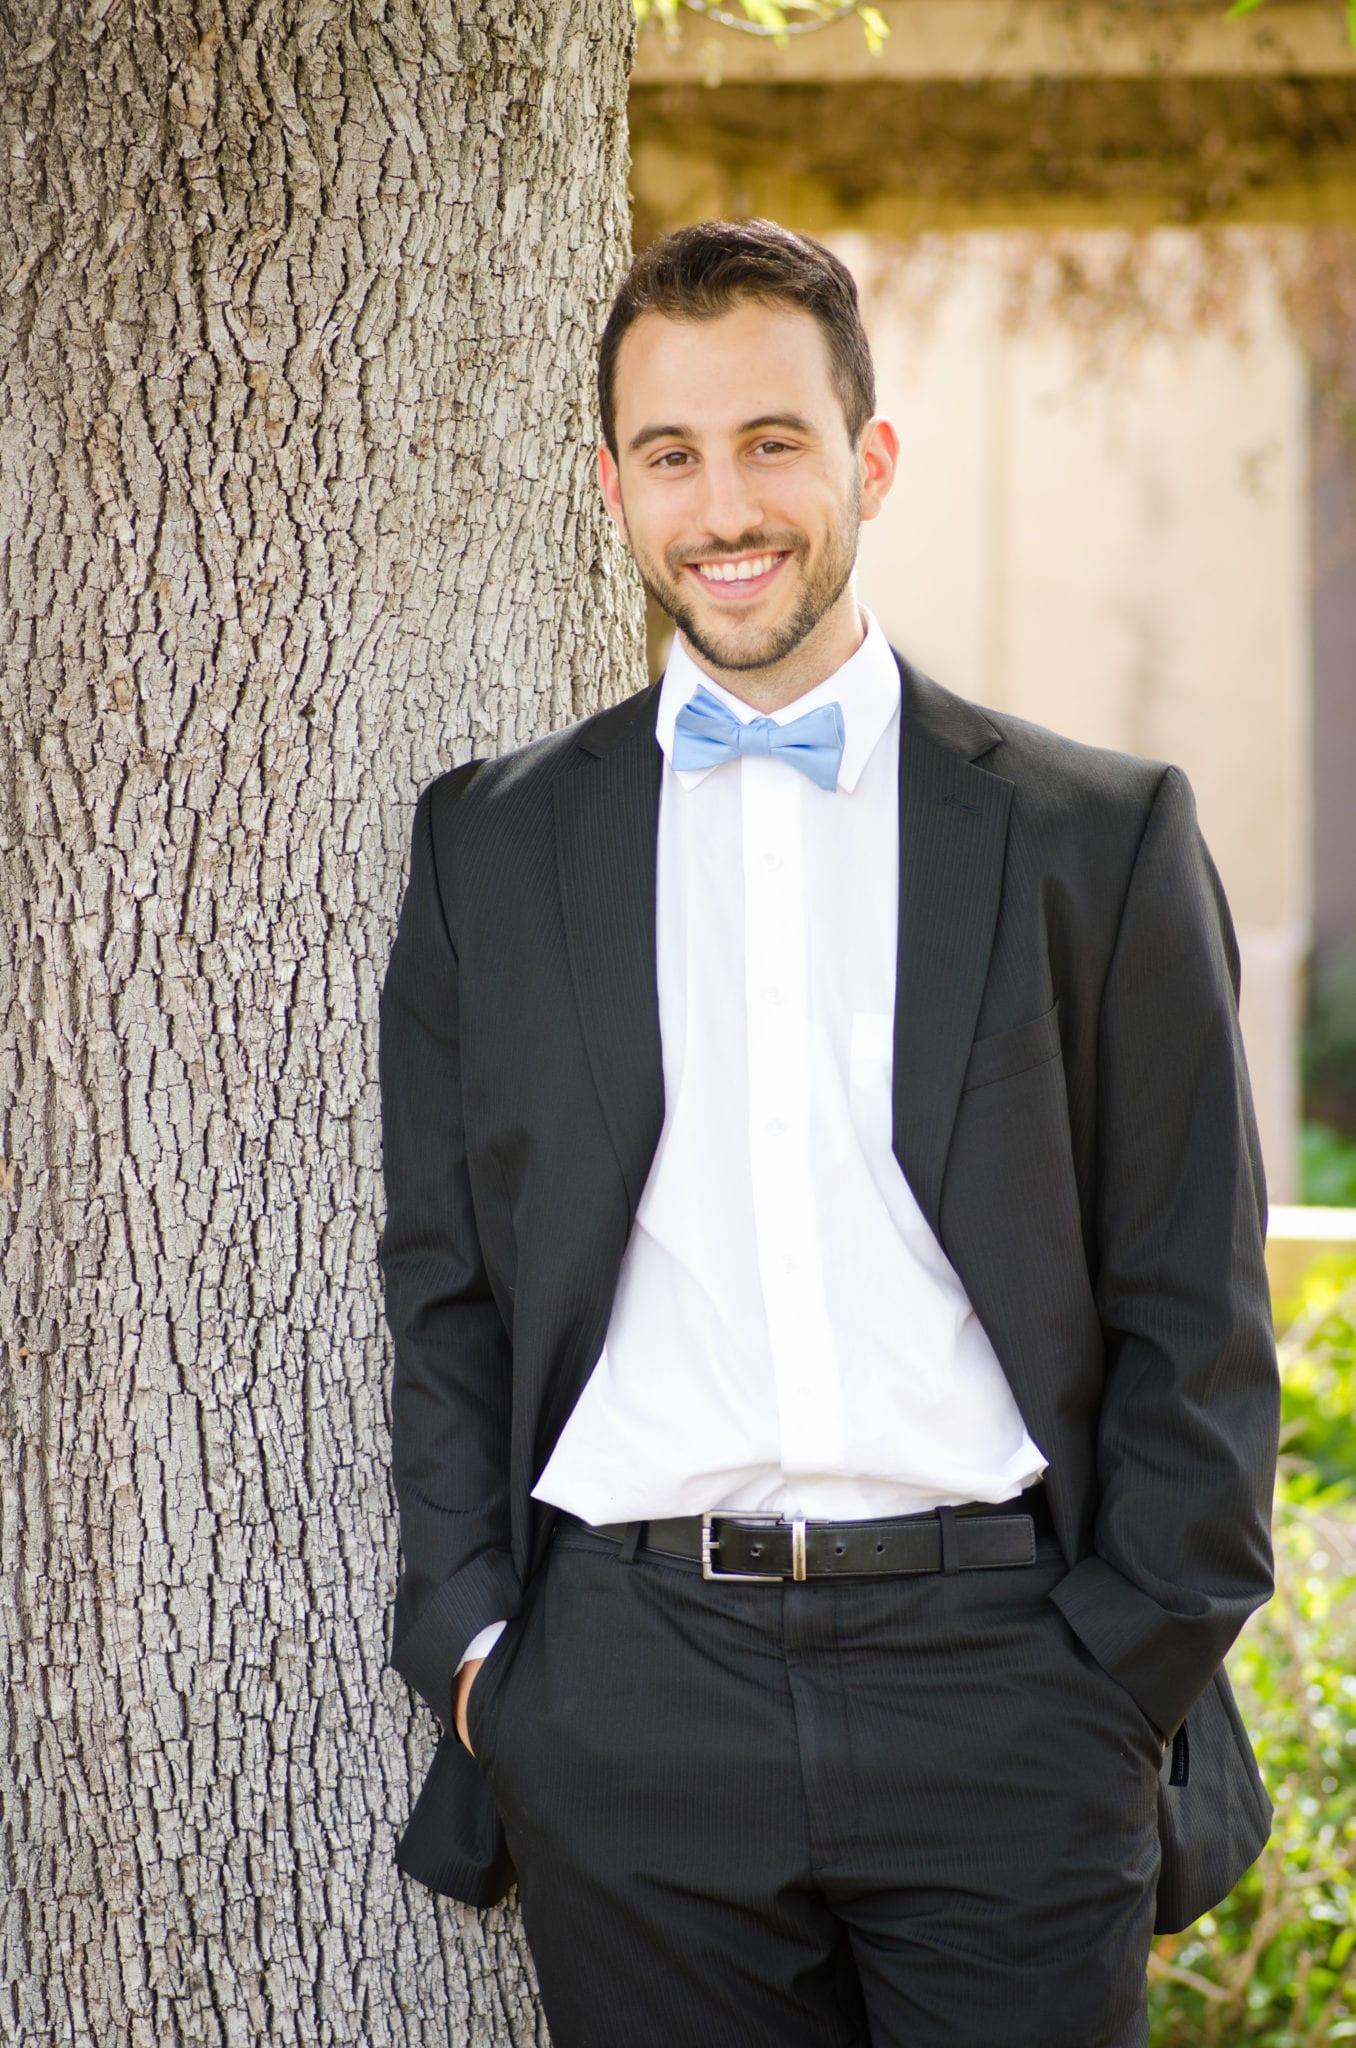 Dr. Scott Spiridigliozzi, ND